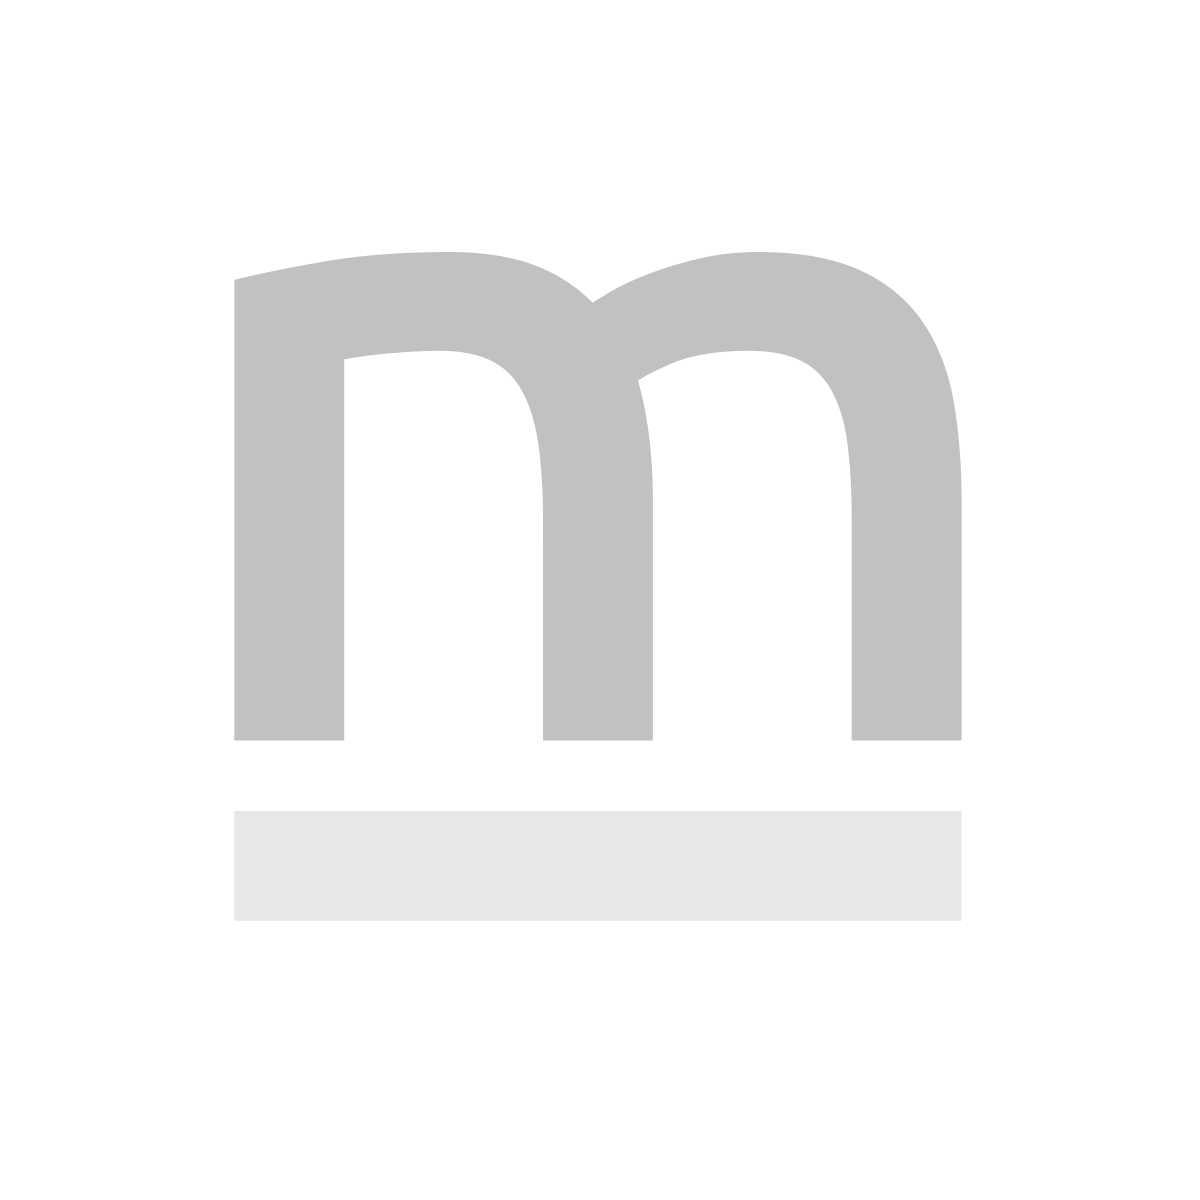 Pokrowiec na materac SMART 100x200